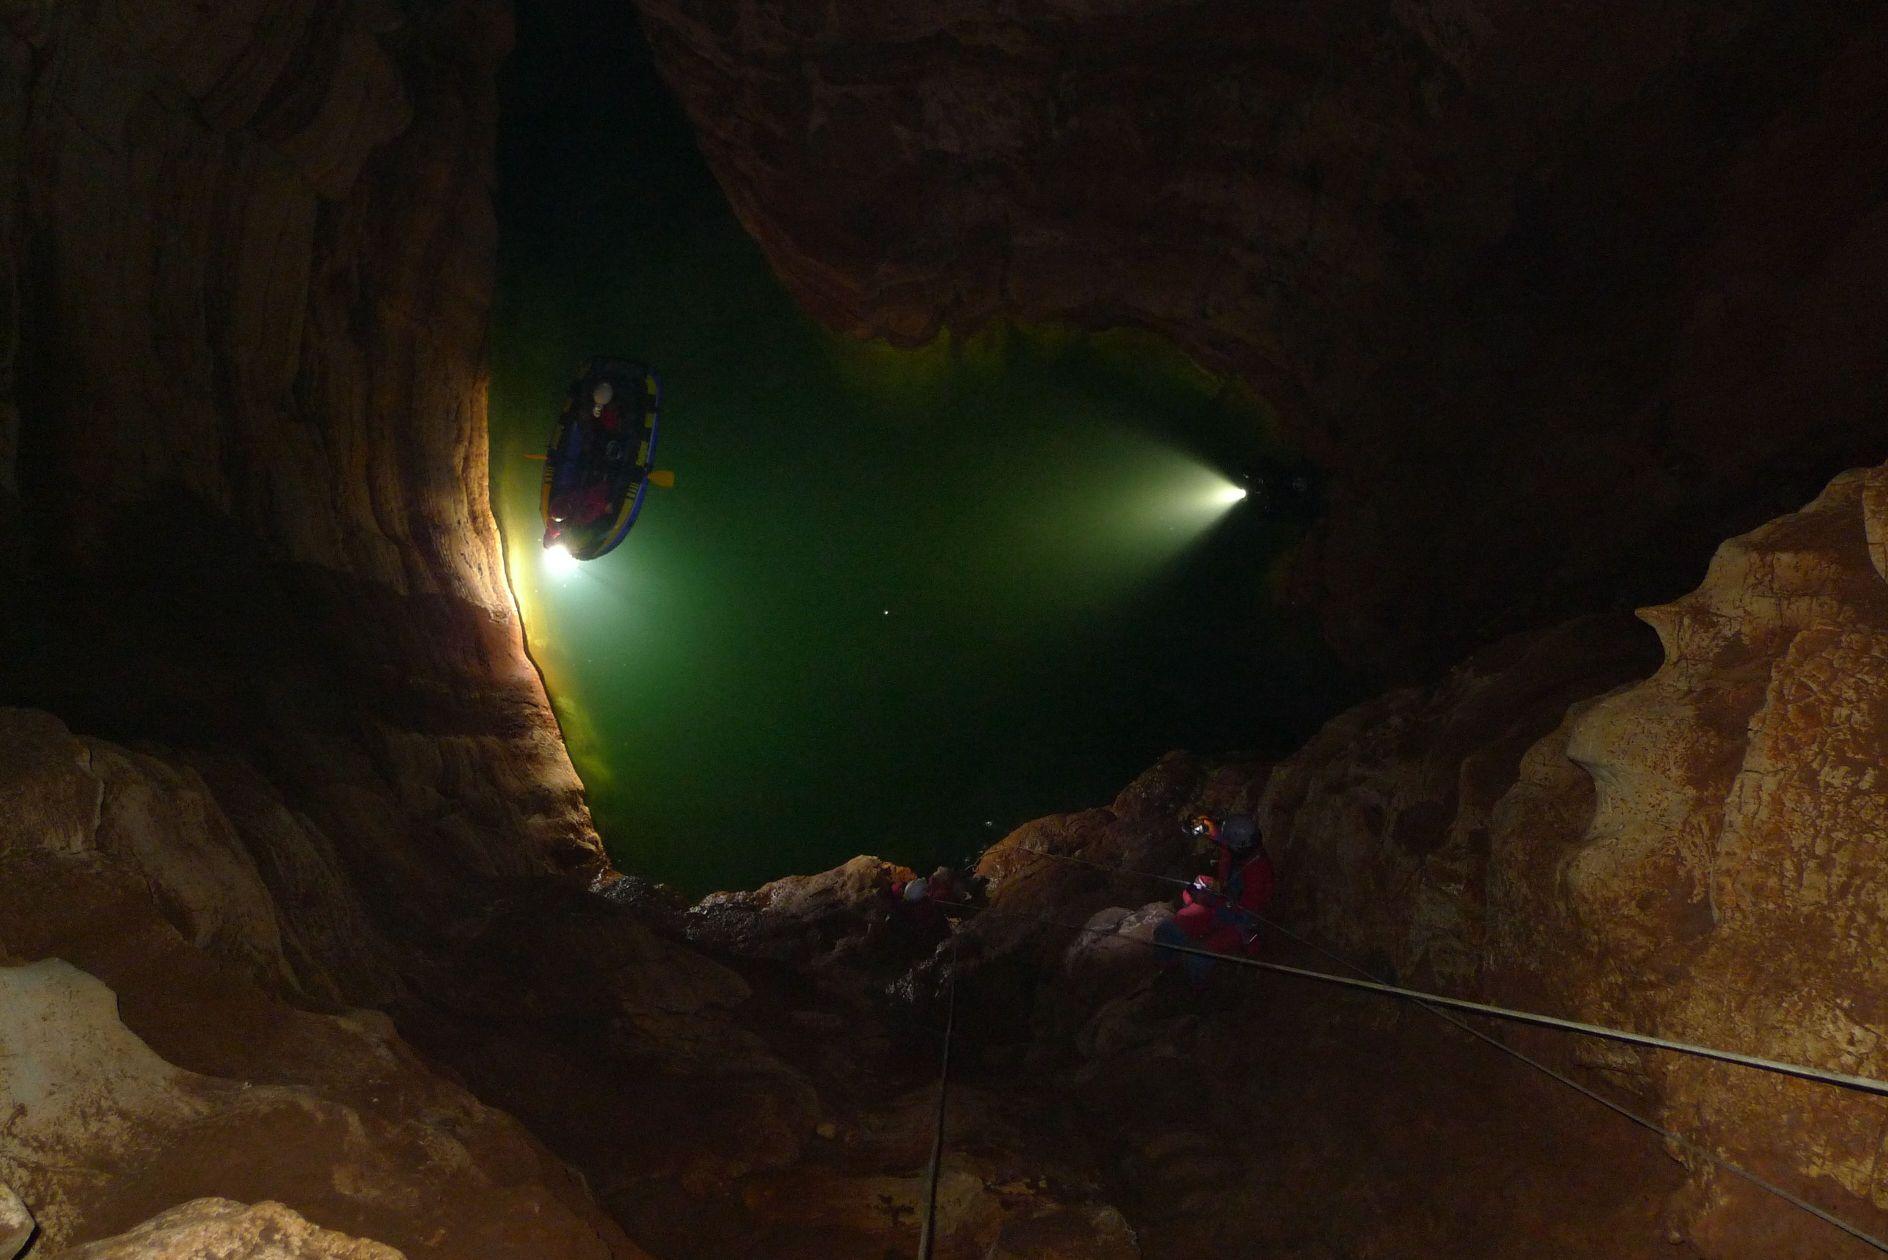 Drugi monitoring čovječje ribice u Picinovoj jami u Istri